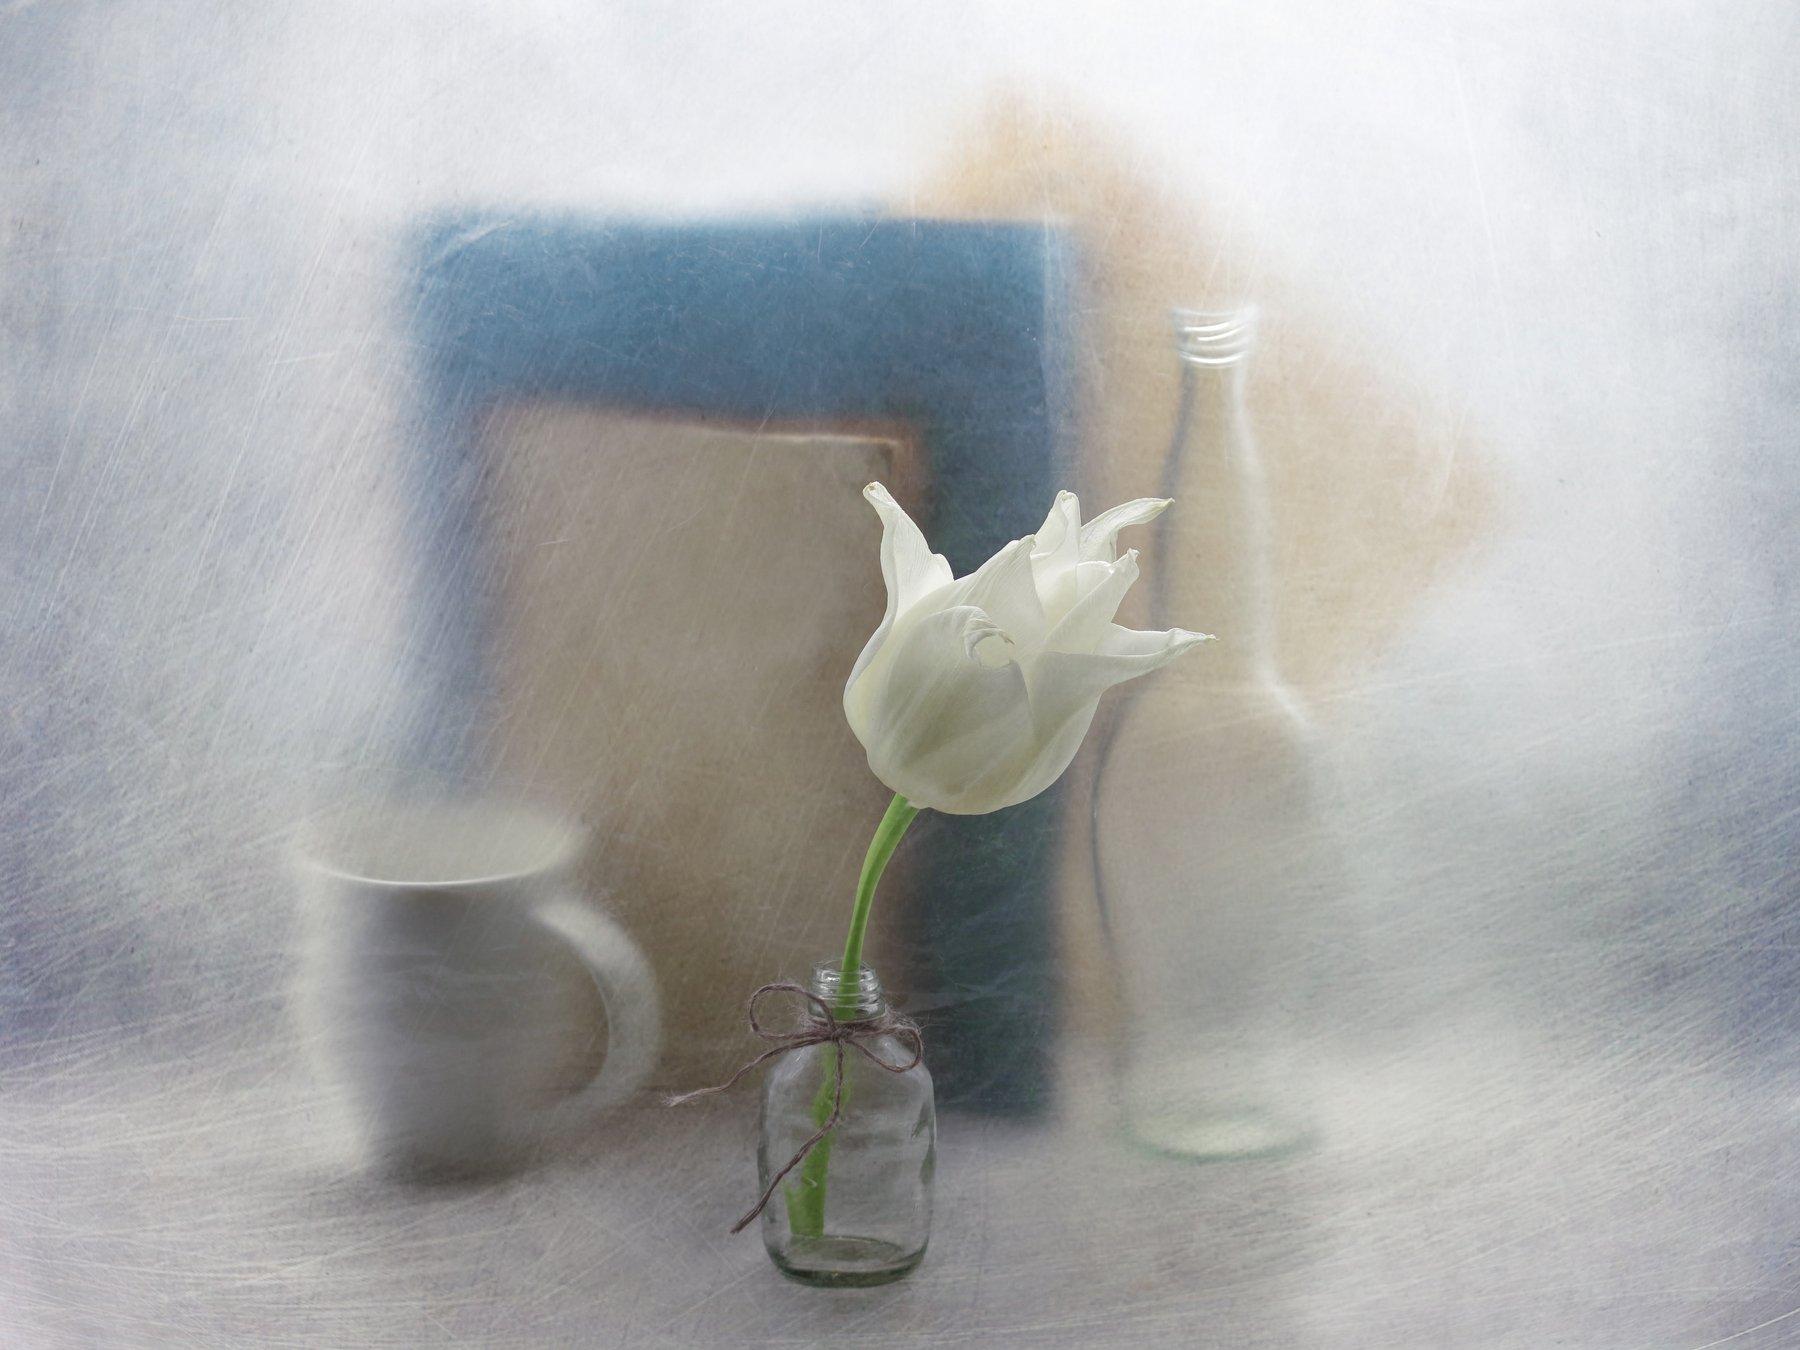 Тюльпан, цветок, натюрморт, чашка, бутылка, бантик, нитка, книга, арт, Елена Лысенко